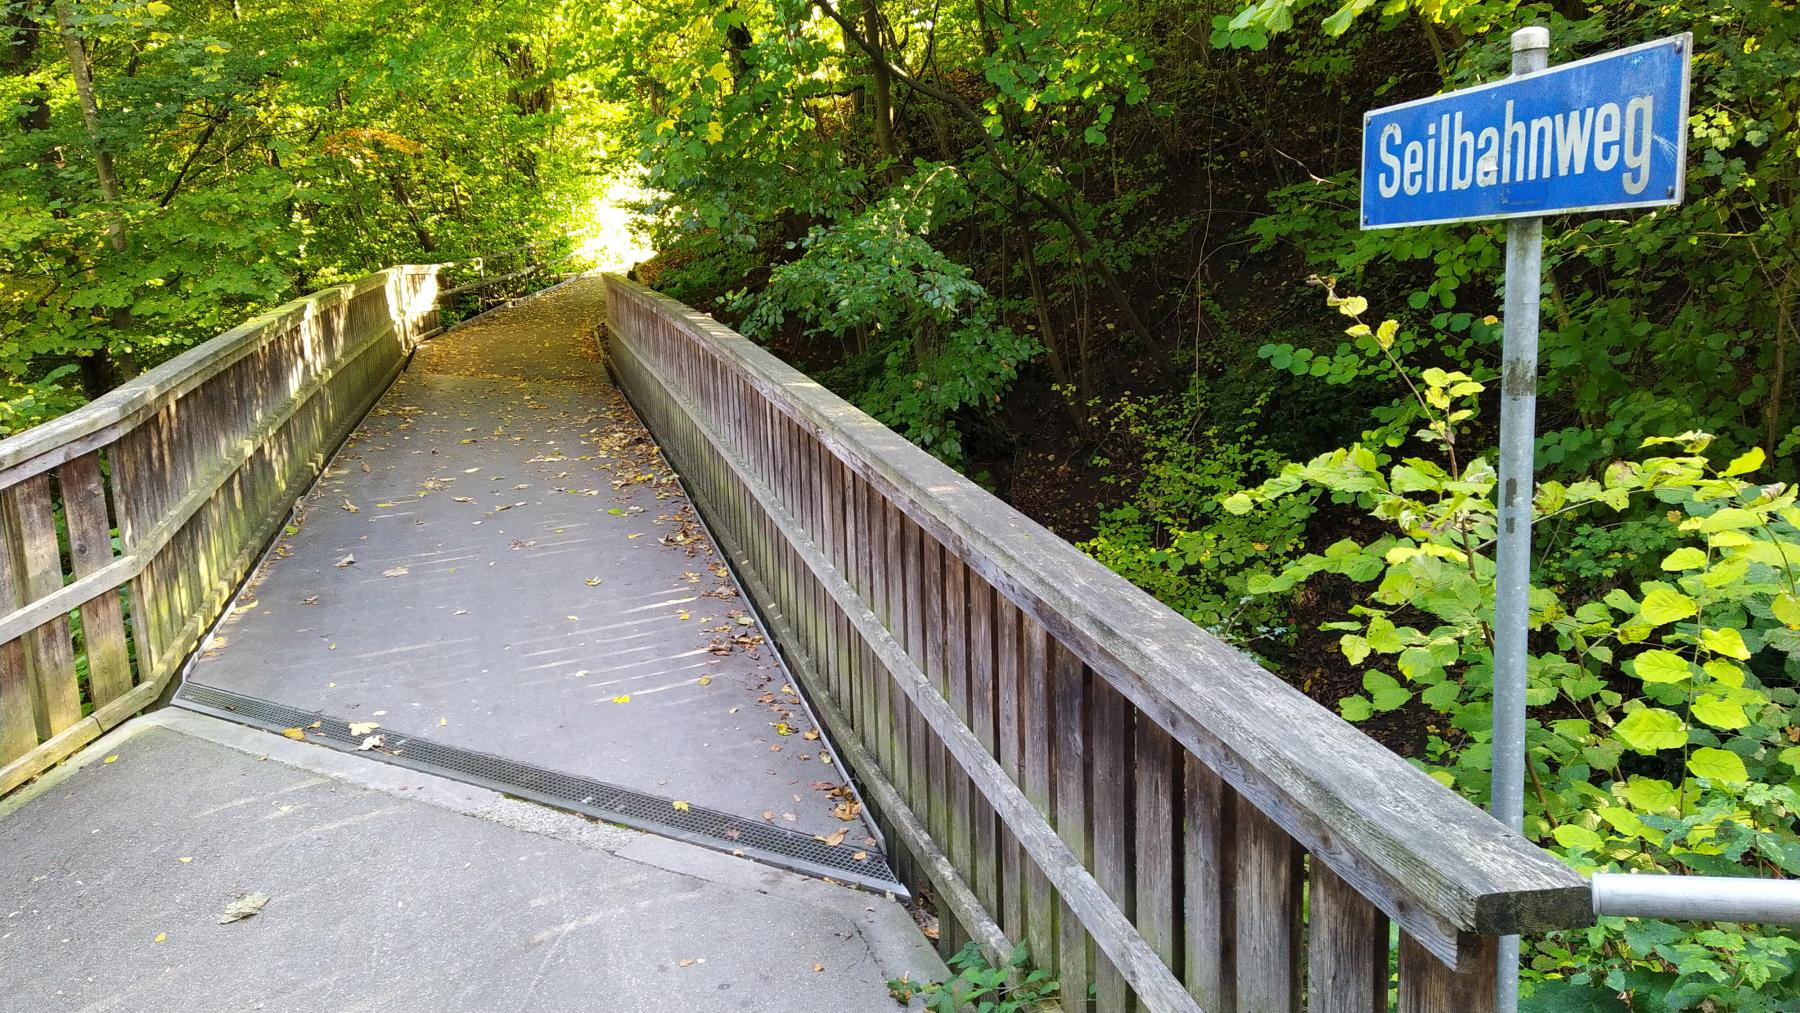 11 Seilbahnweg